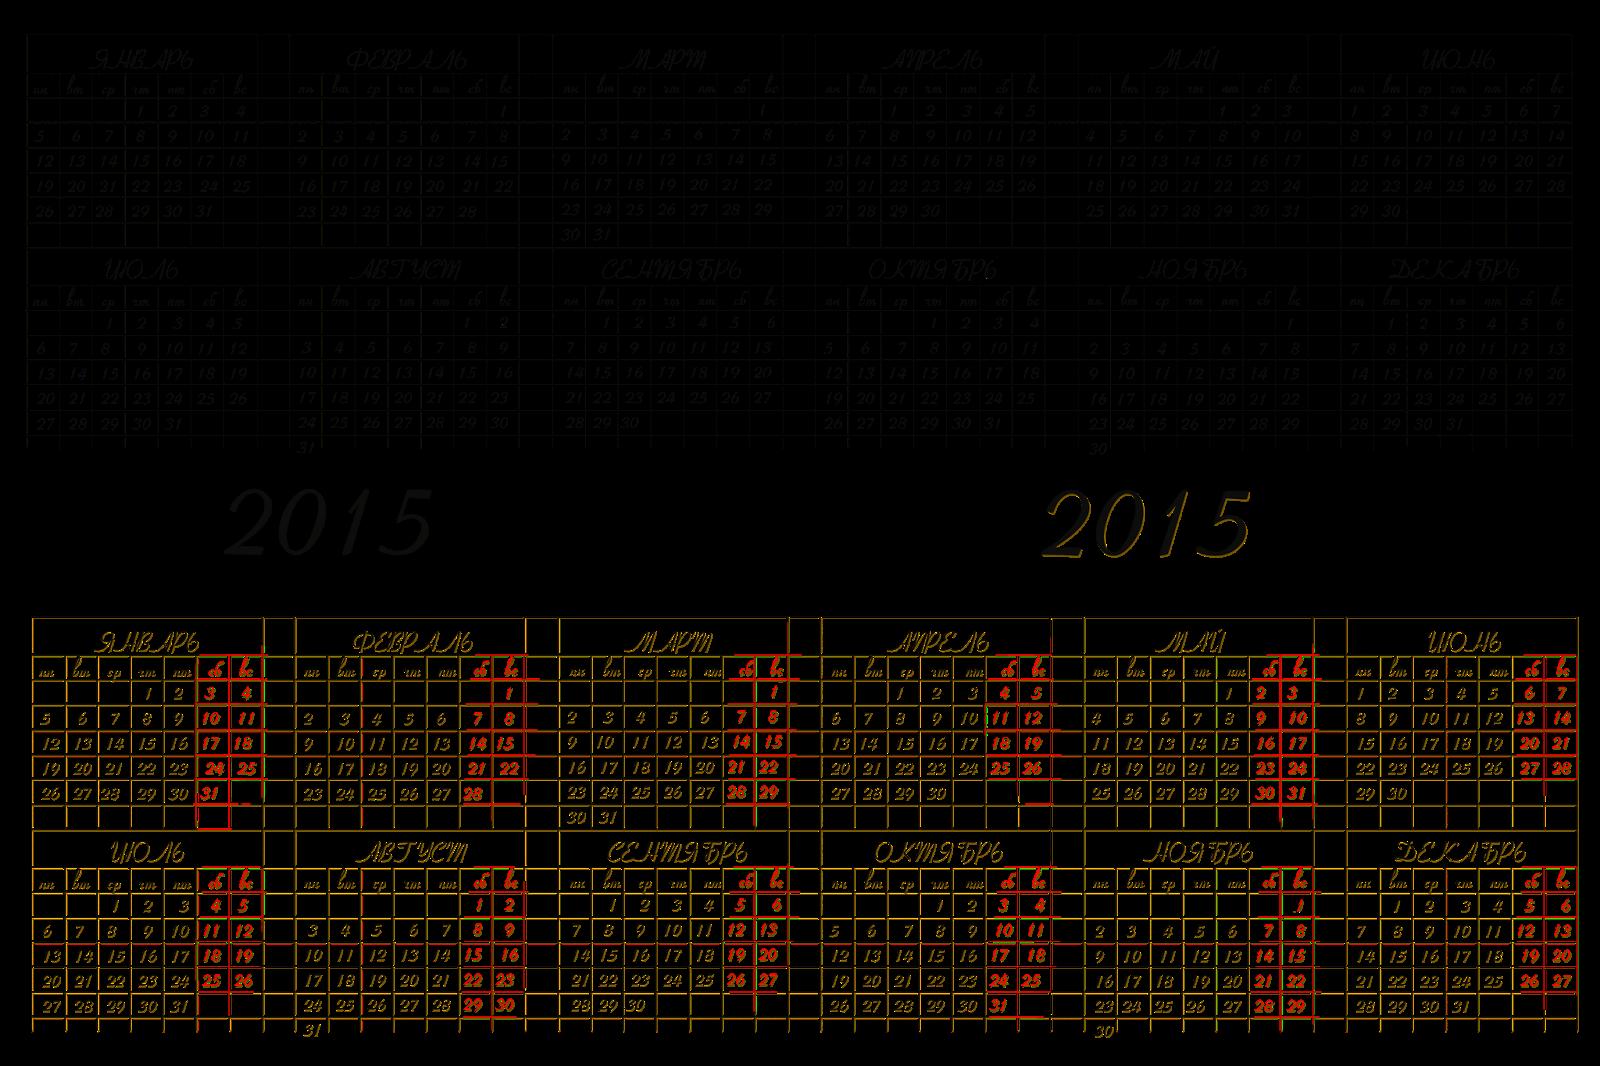 Церковные календарь 2013 году